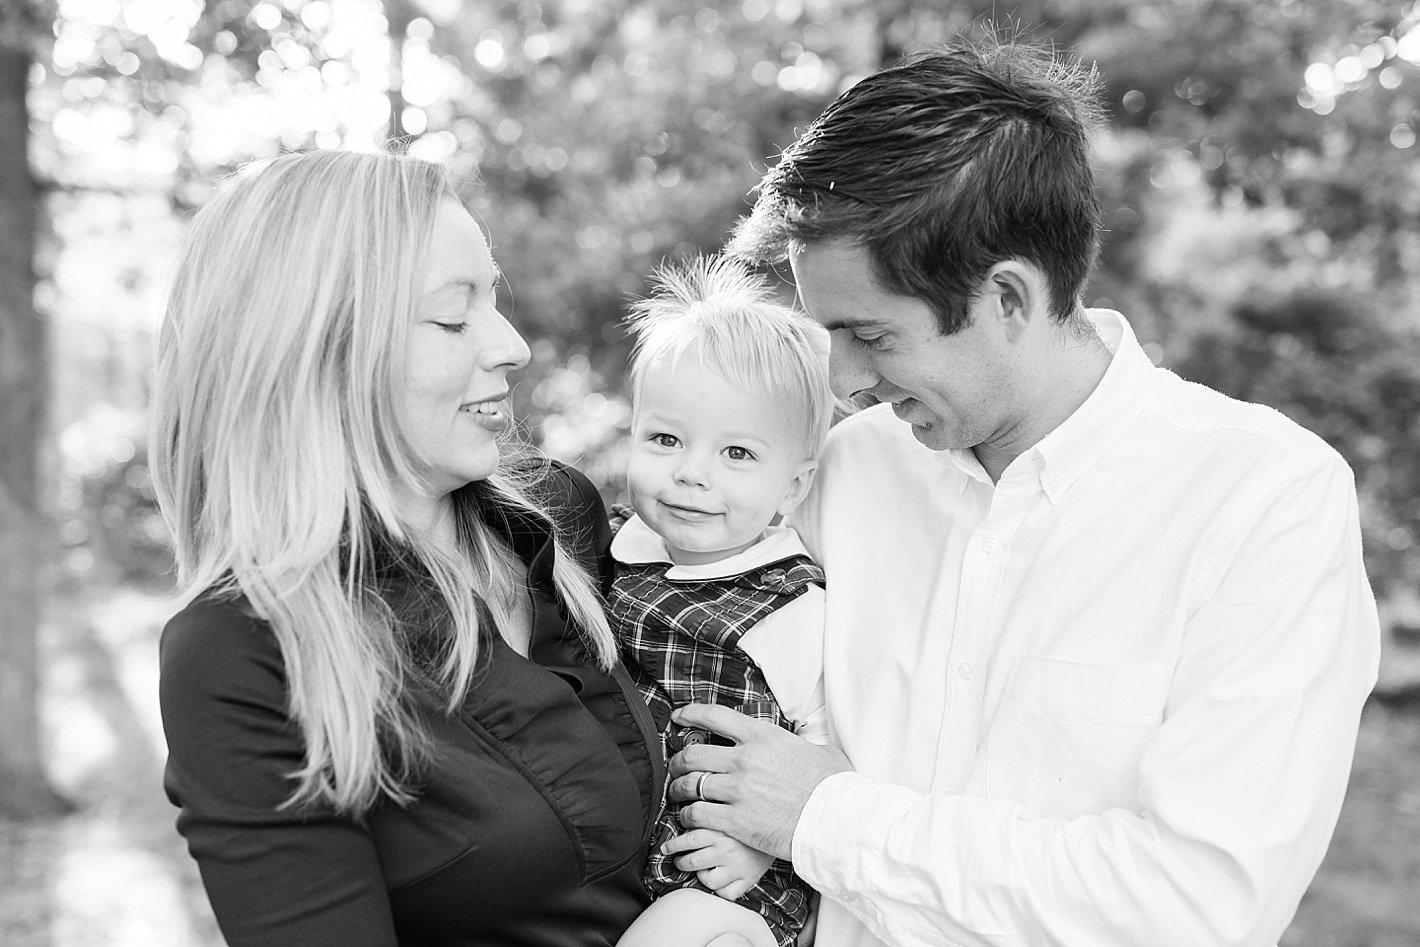 Howard_County_family_photographer_arpasi_photography-9